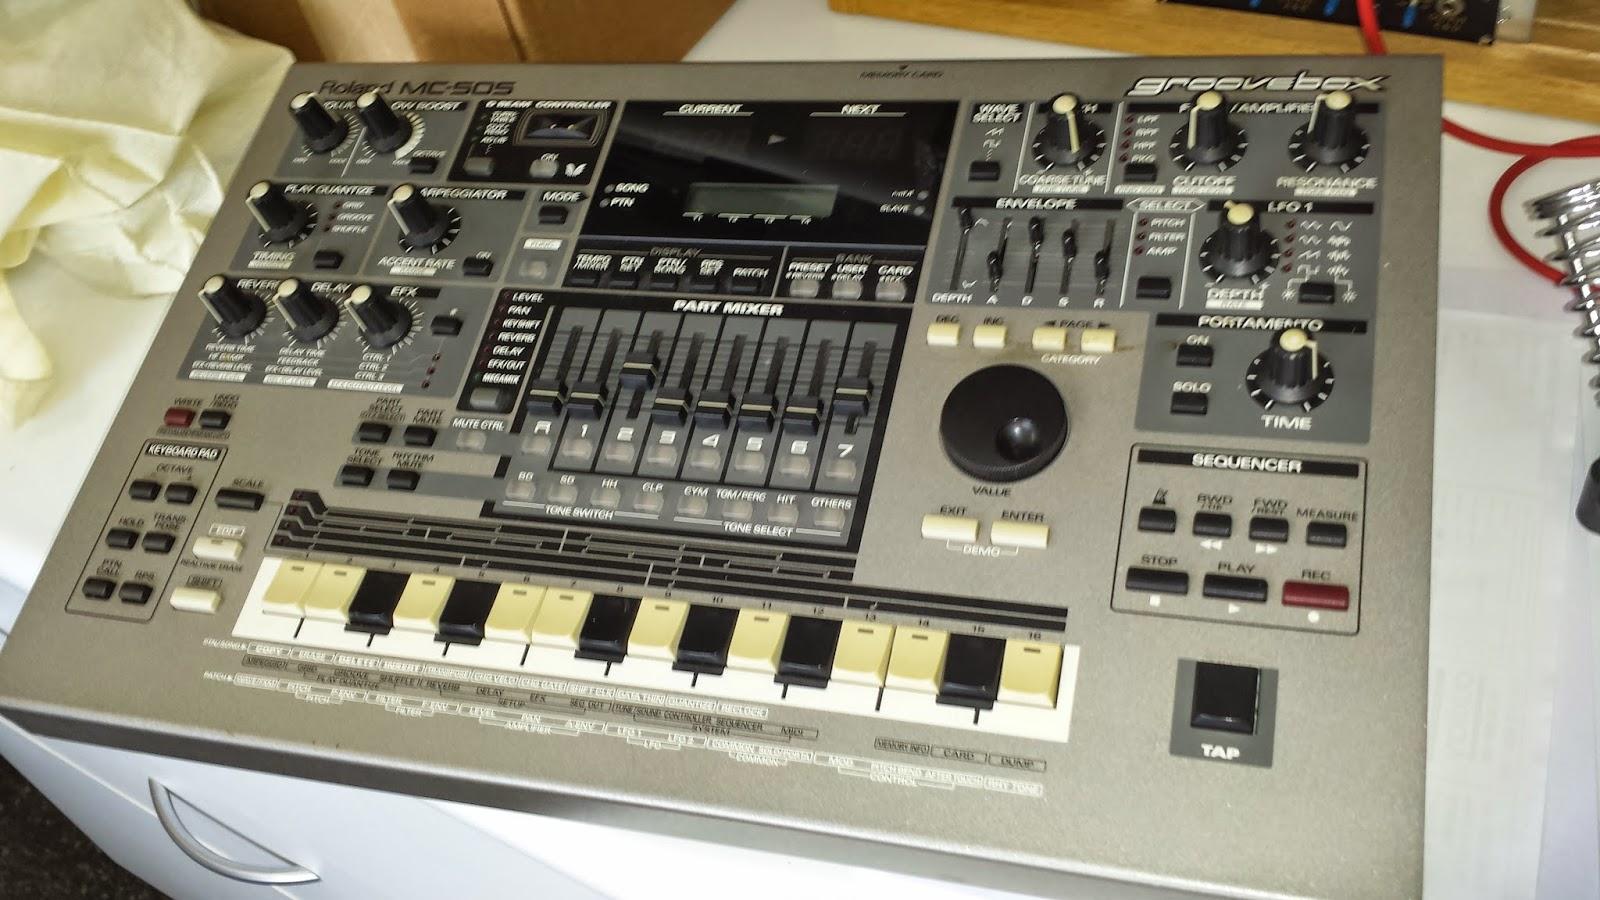 JonDent - Exploring Electronic Music: Roland MC 505 - Groove box